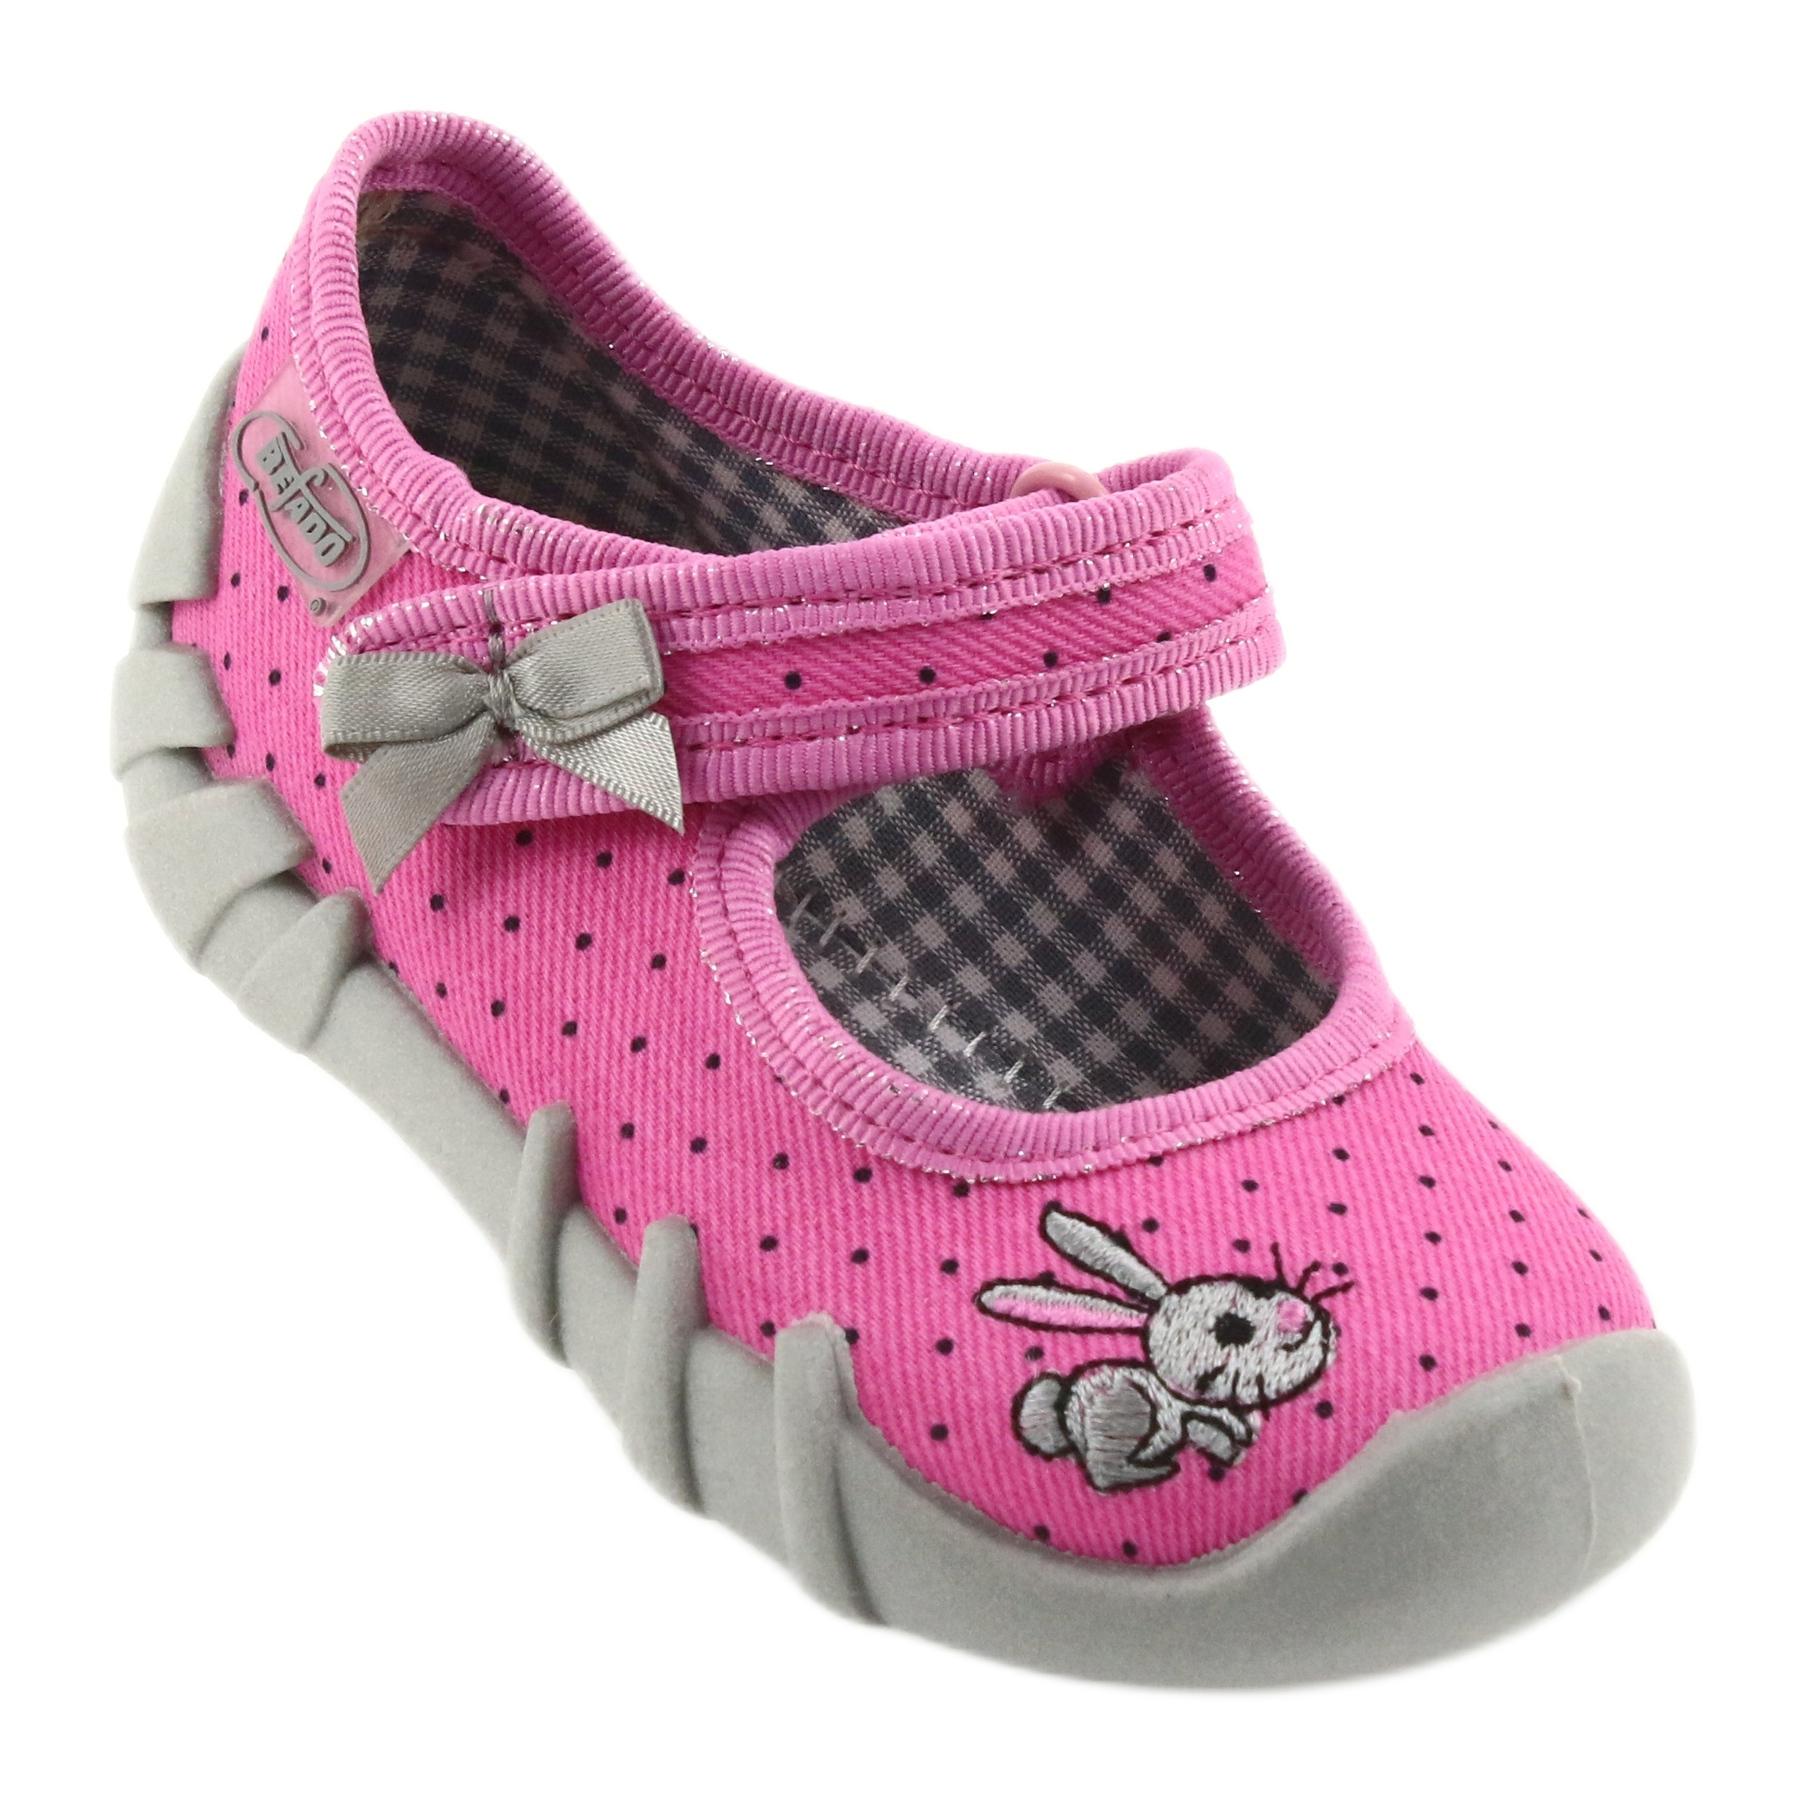 miniatura 2 - Pantofole da ballerina Befado per bambini 109P169 nero grigio rosa